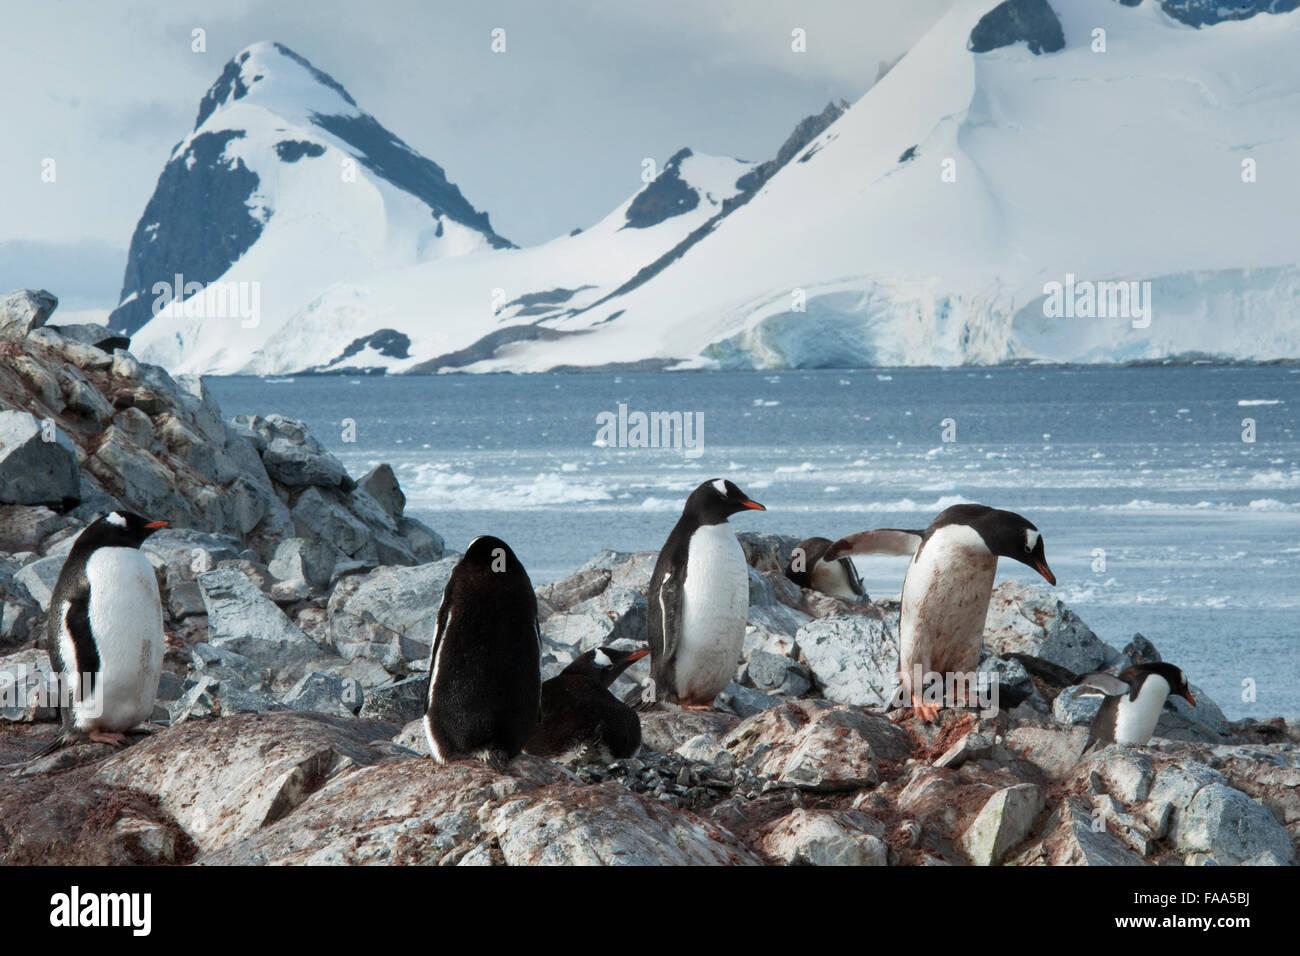 Gentoo penguin colony with chicks Pygoscelis papua Pleneau Island, Antarctic Peninsula. Stock Photo